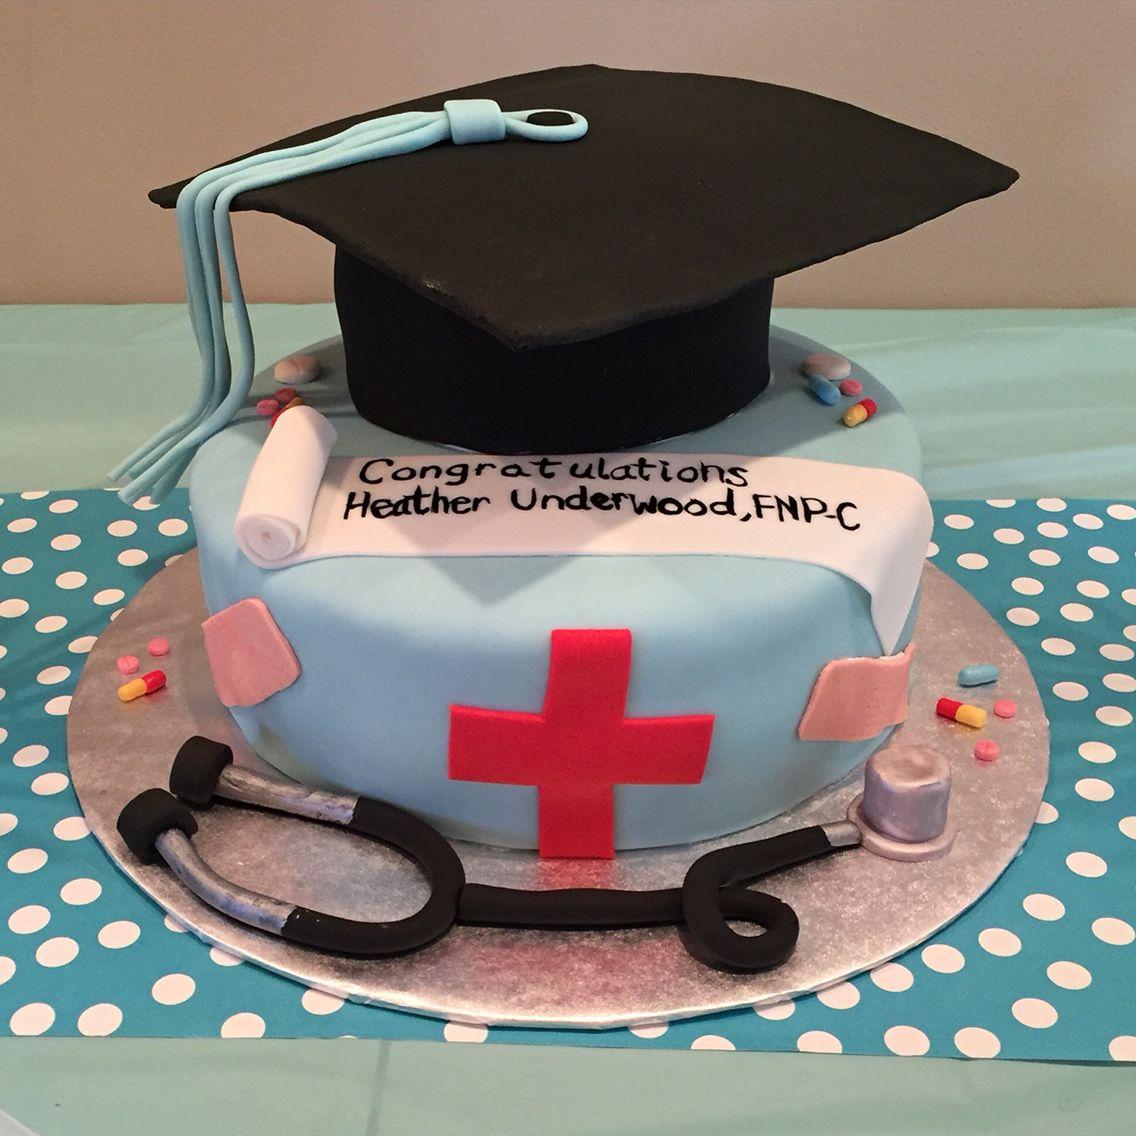 Nurse Practioner Graduation Party Ideas